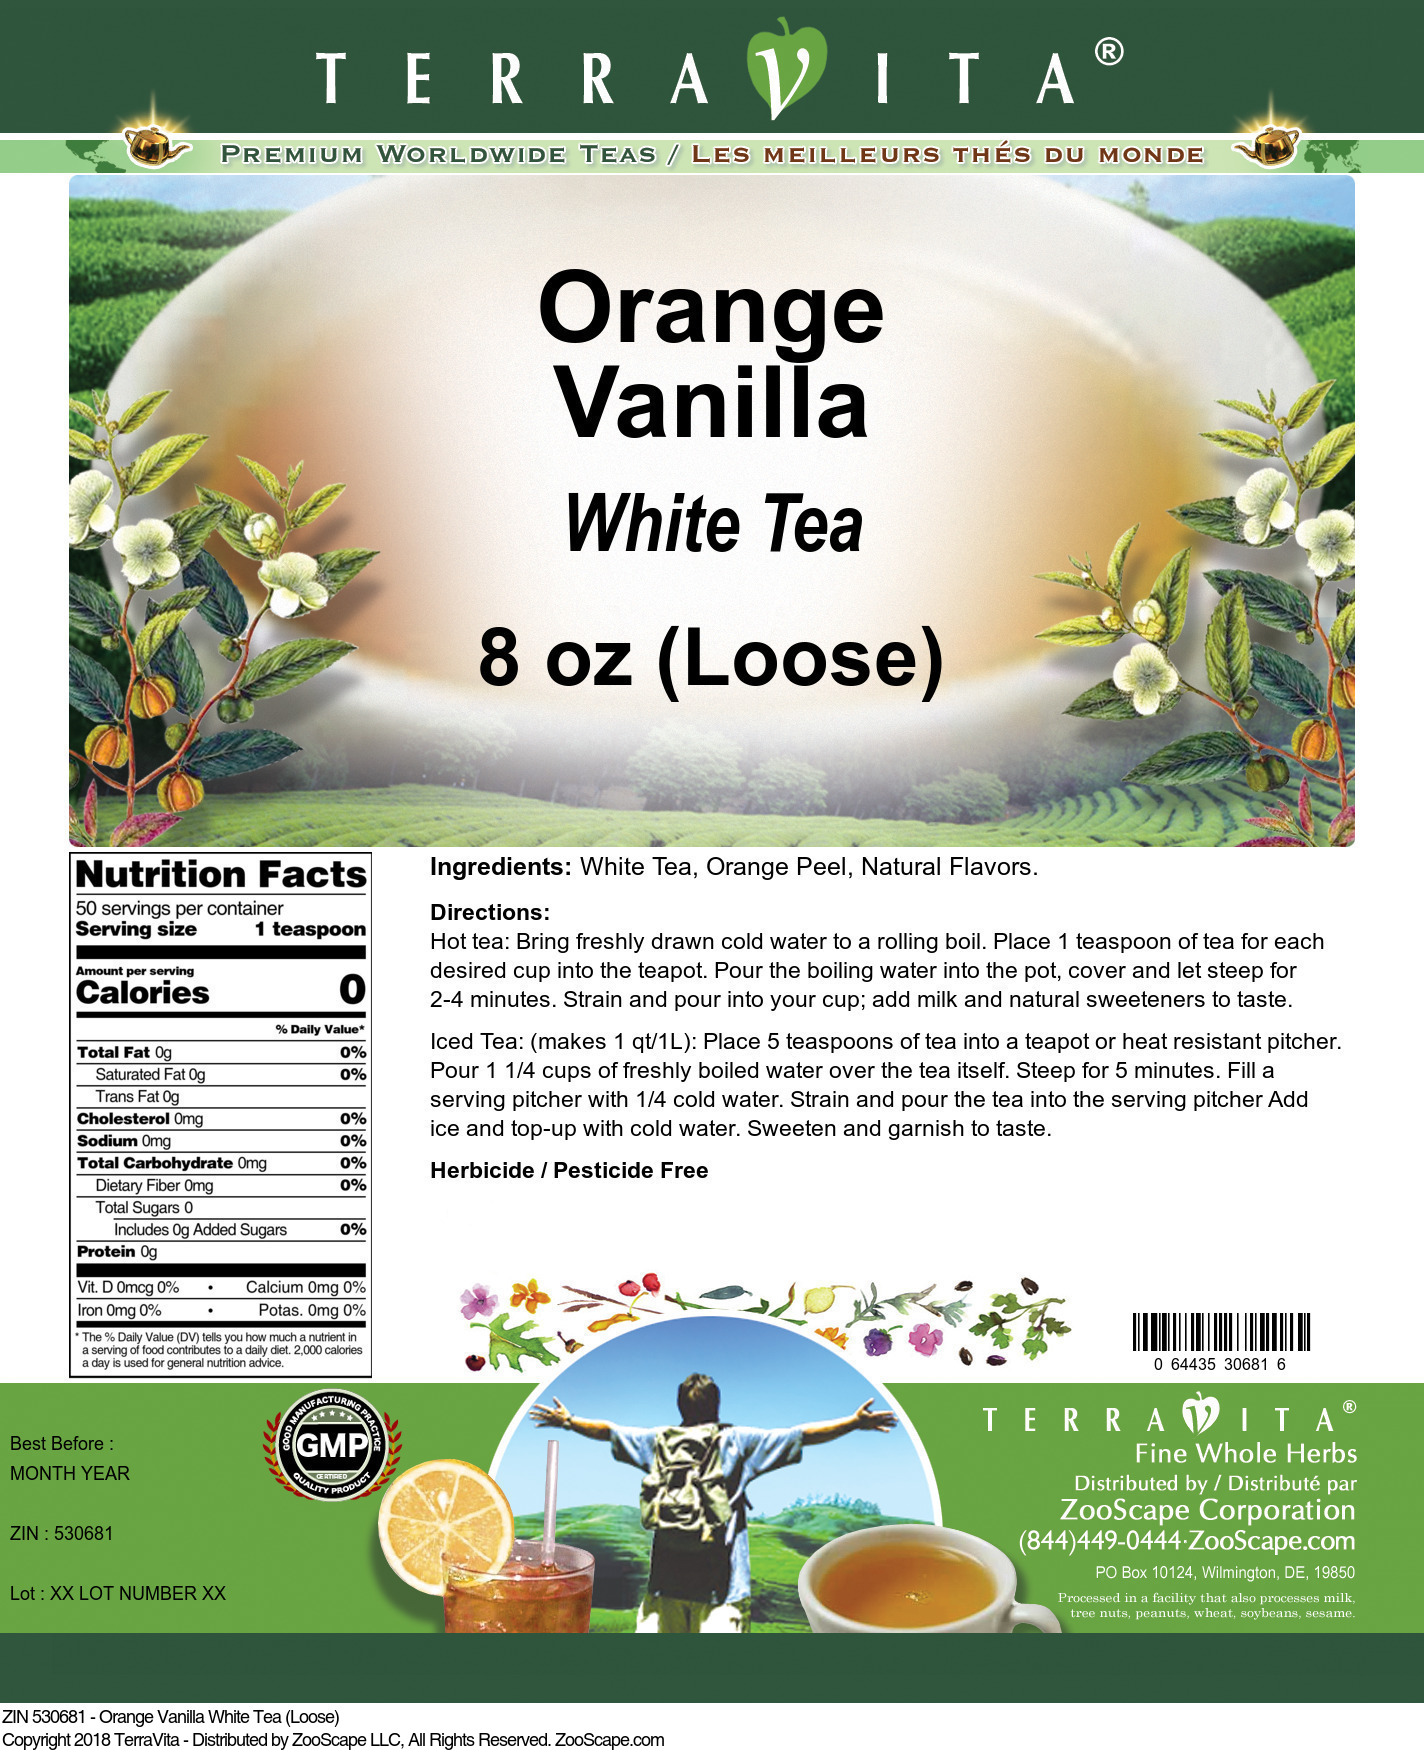 Orange Vanilla White Tea